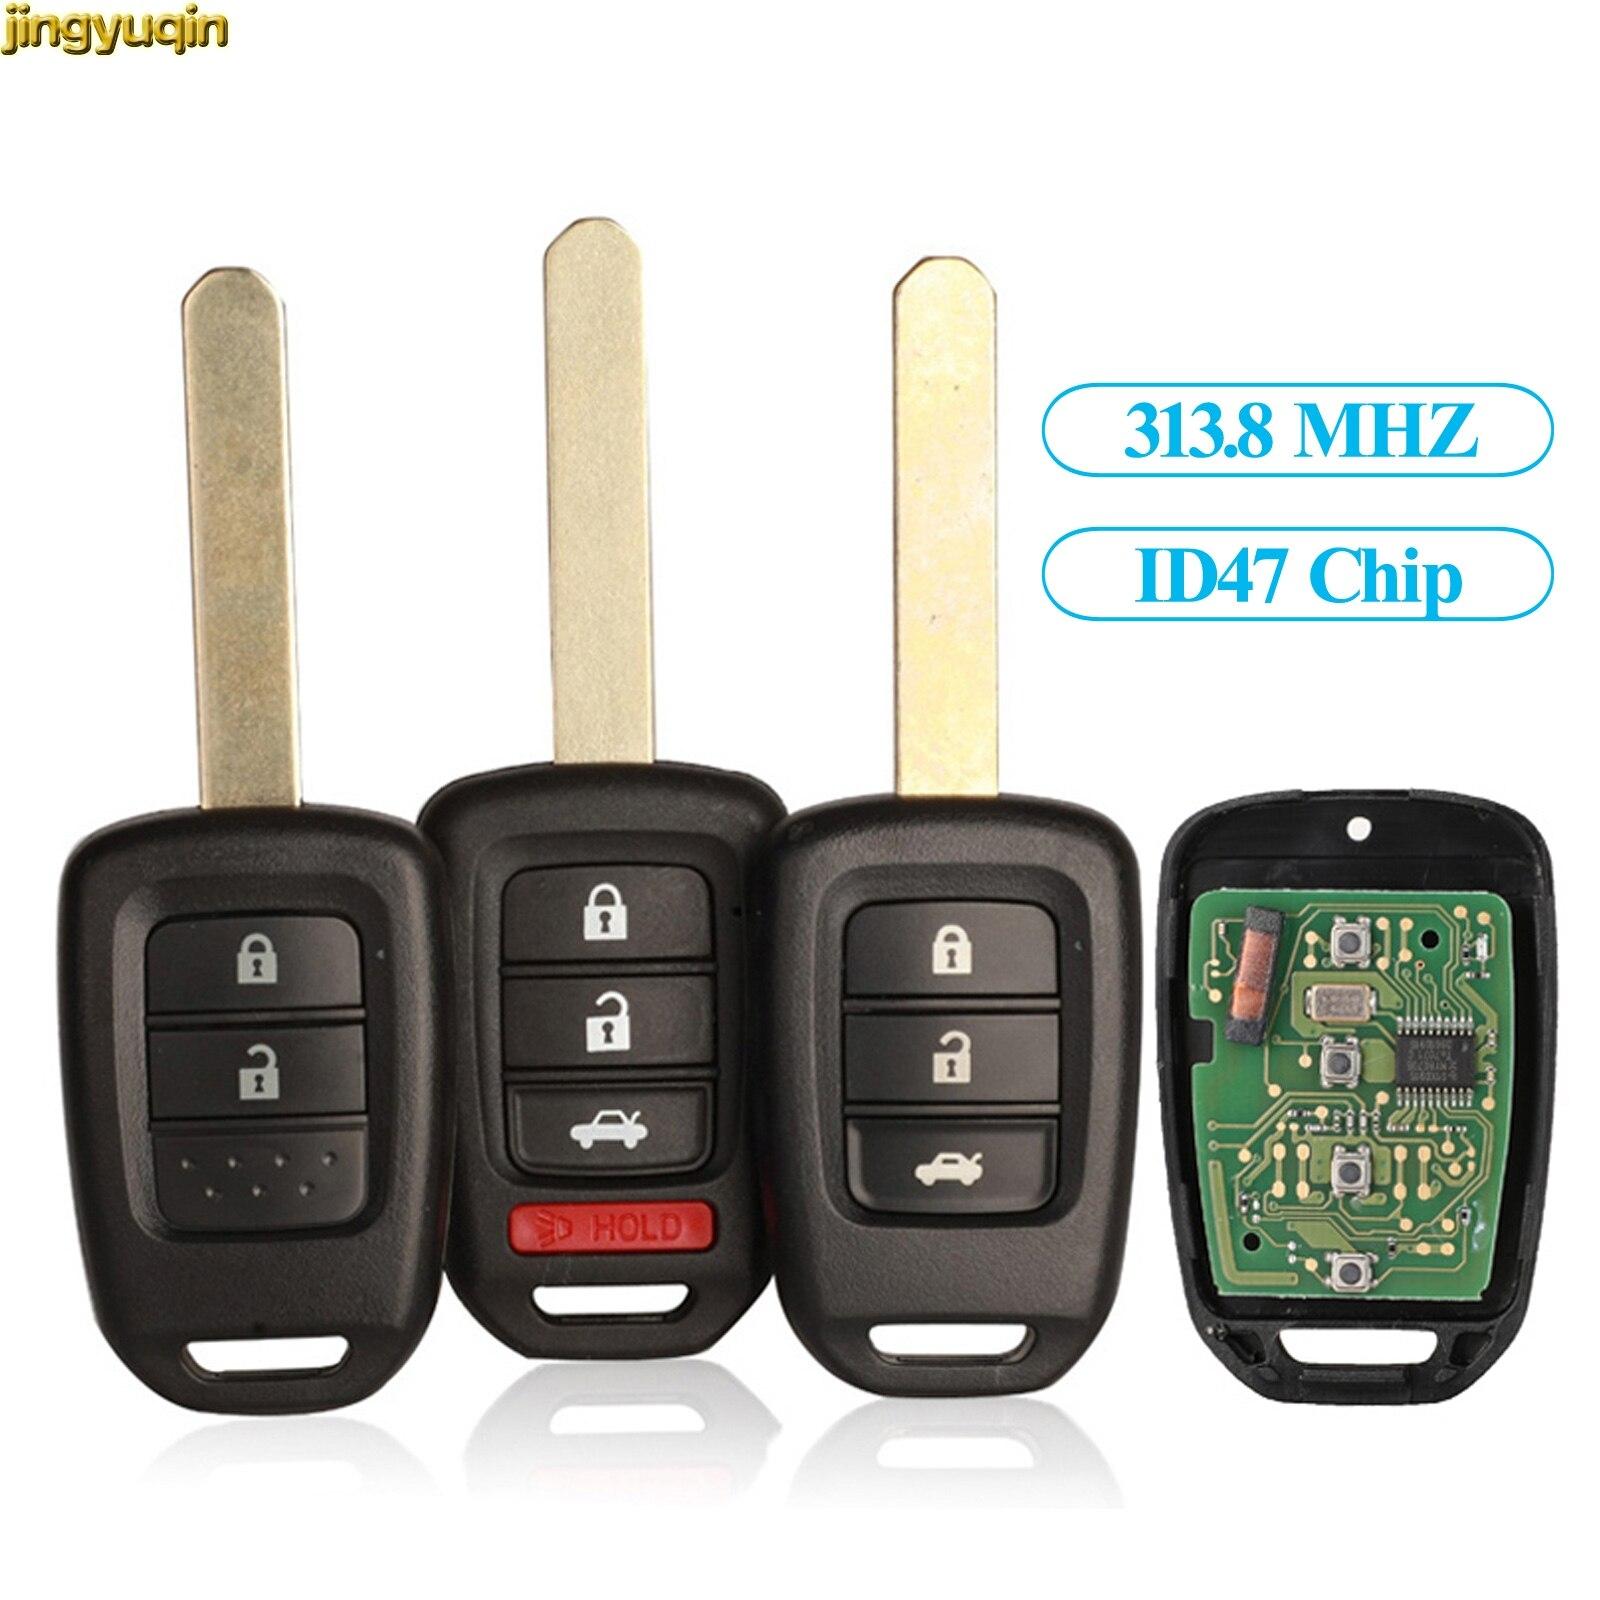 Jingyuqin controle remoto chave do carro 313.8mhz id47 chip keyless para honda accord 2013 2014 2015 2016 2017 MLBHLIK6-IL 2/3/4btn